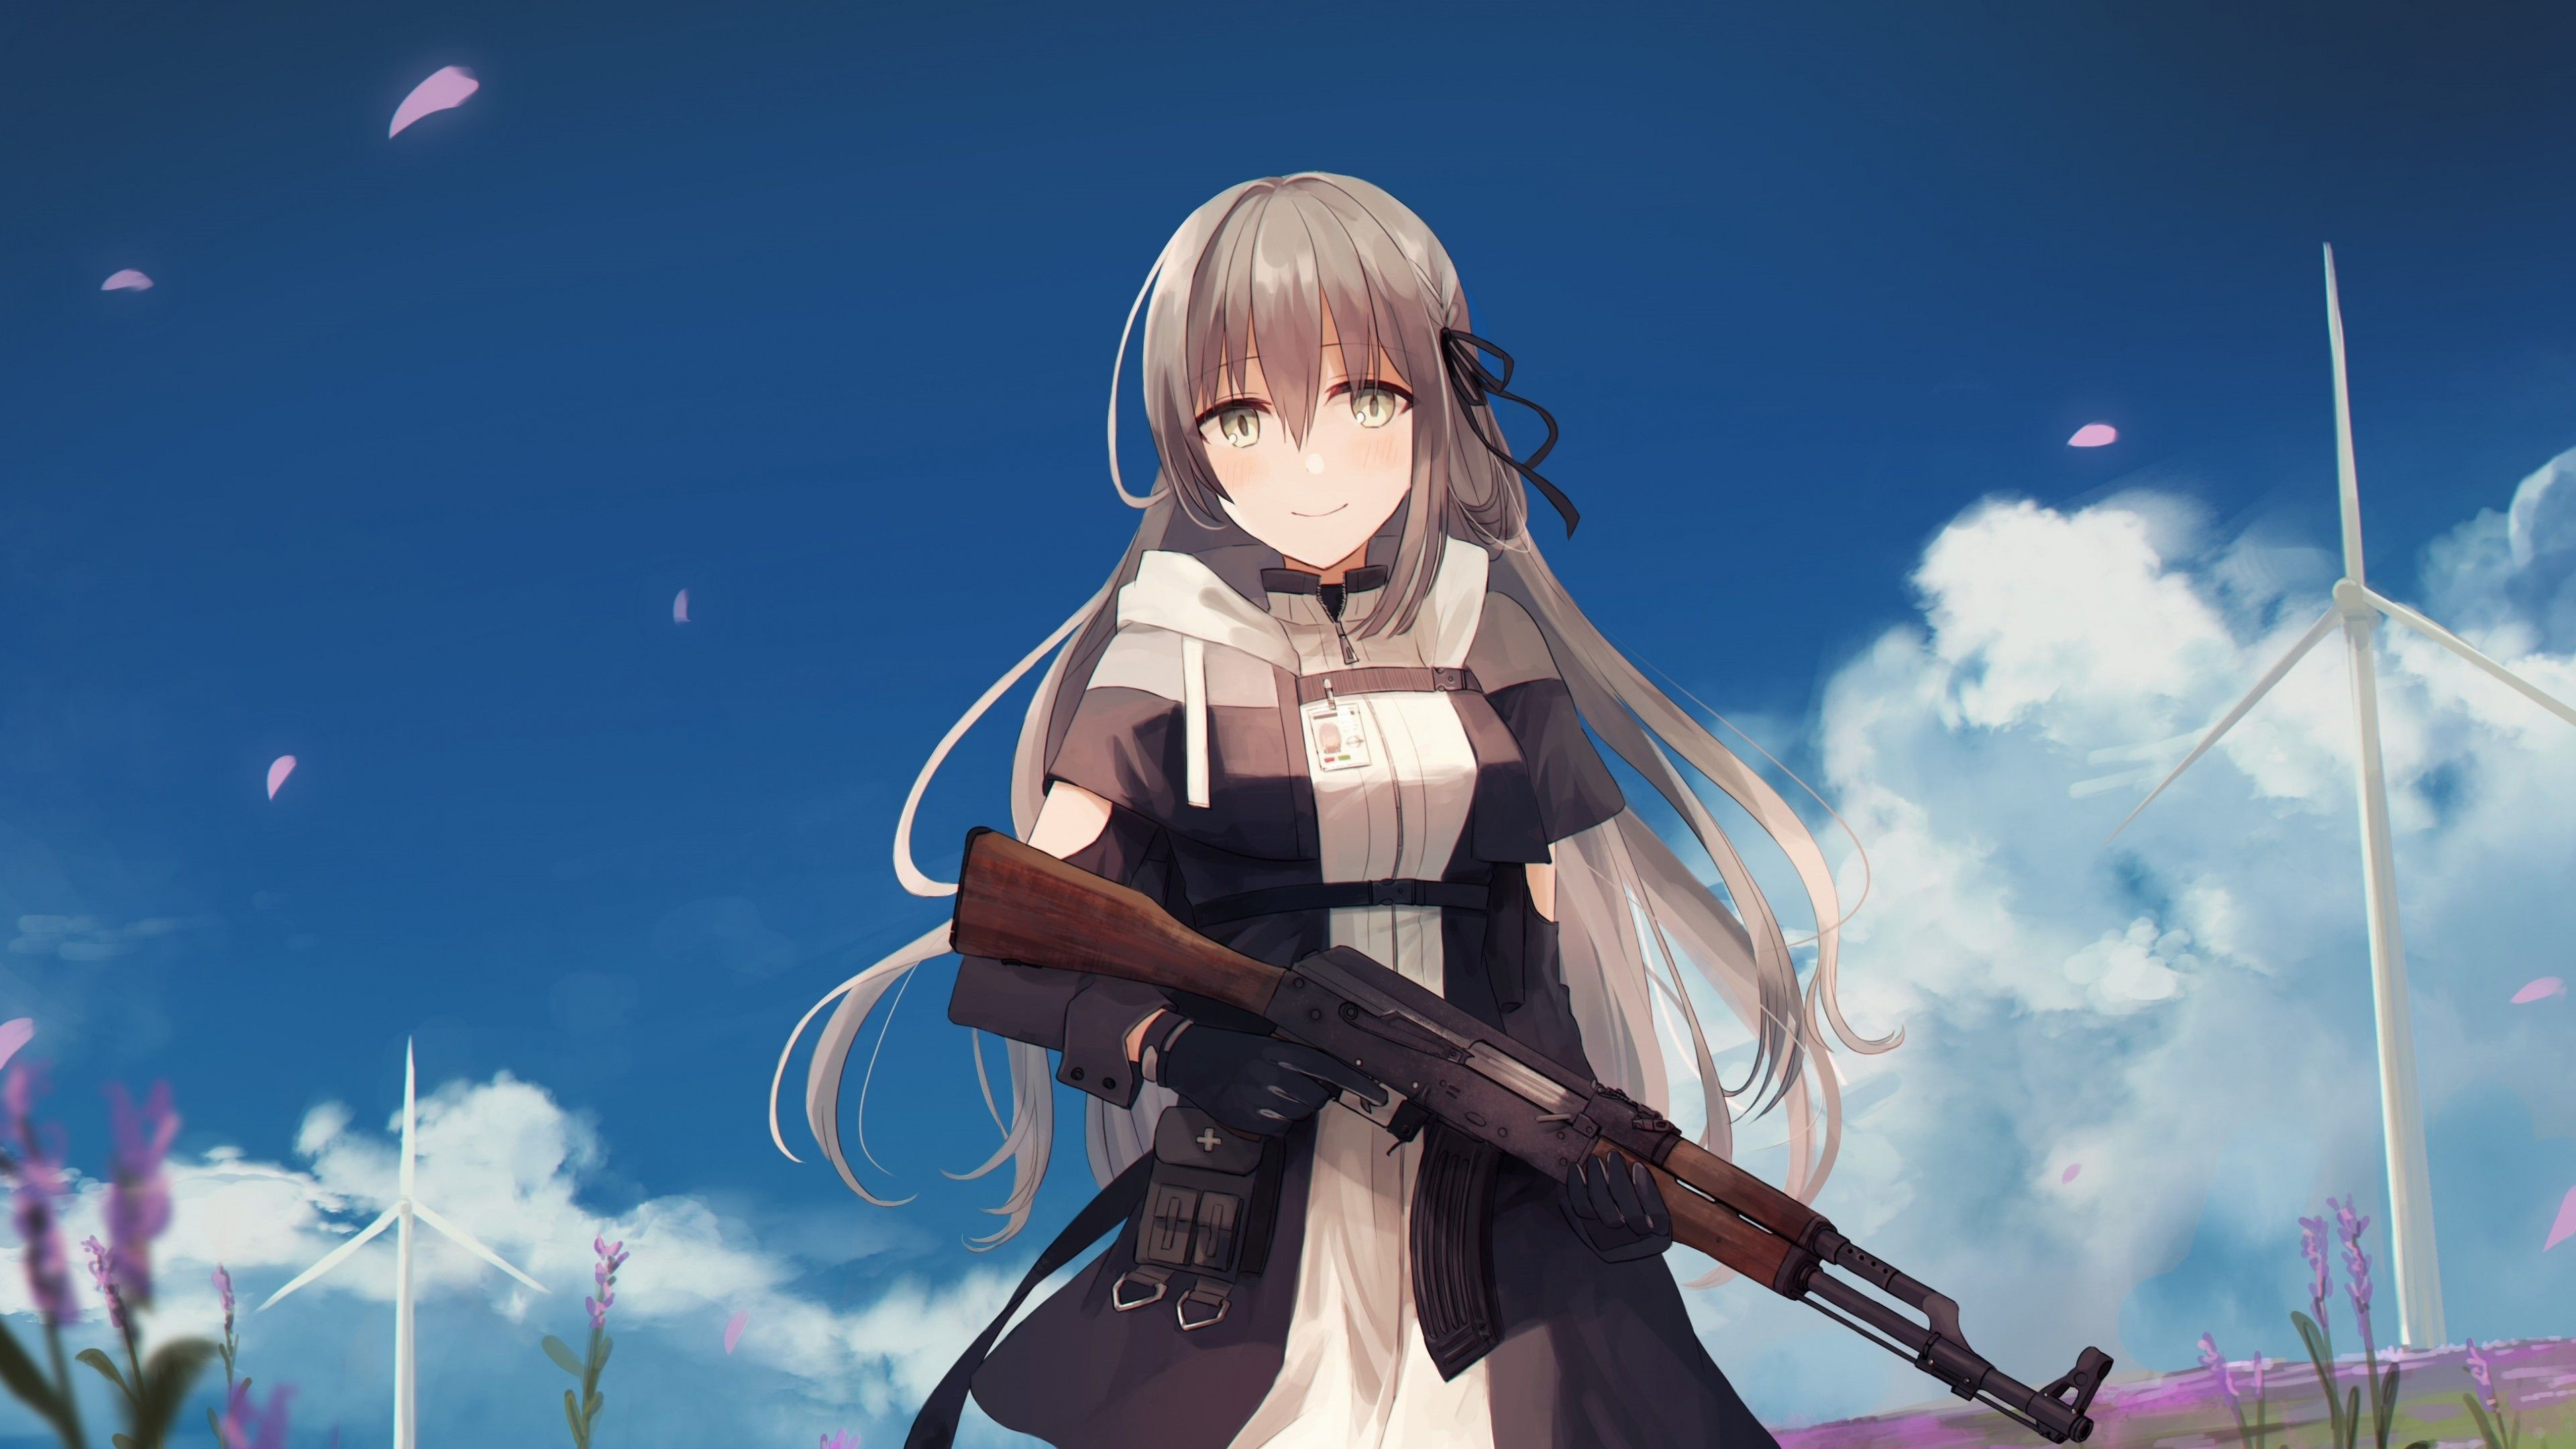 War Anime Girl Wallpapers - Top Free War Anime Girl Backgrounds